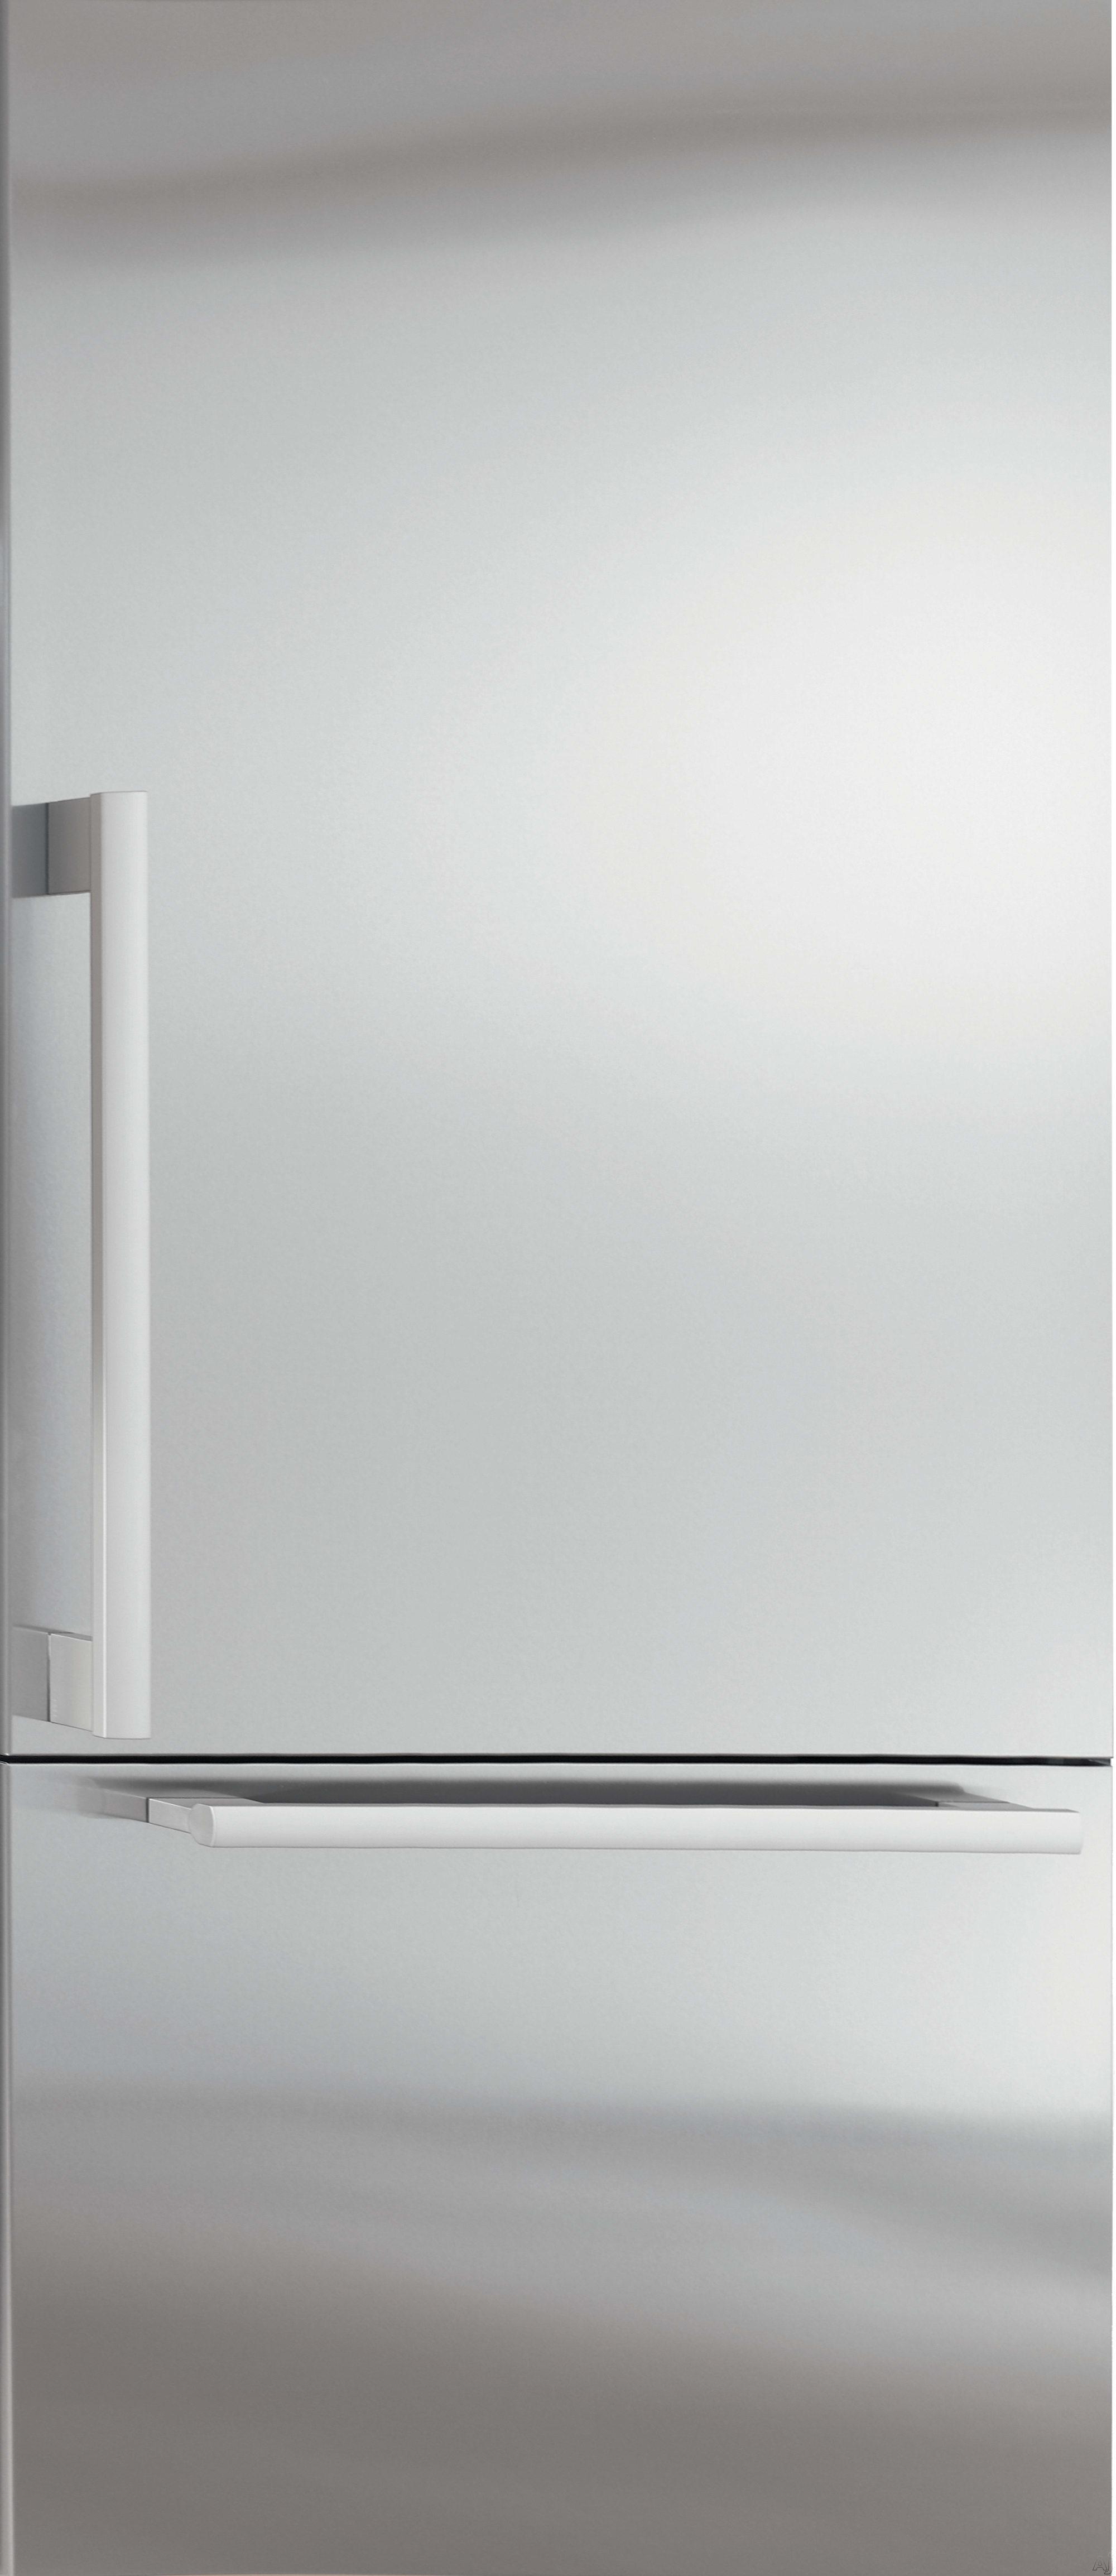 Miele Kf1903vi 36 Inch Built In Bottom Freezer